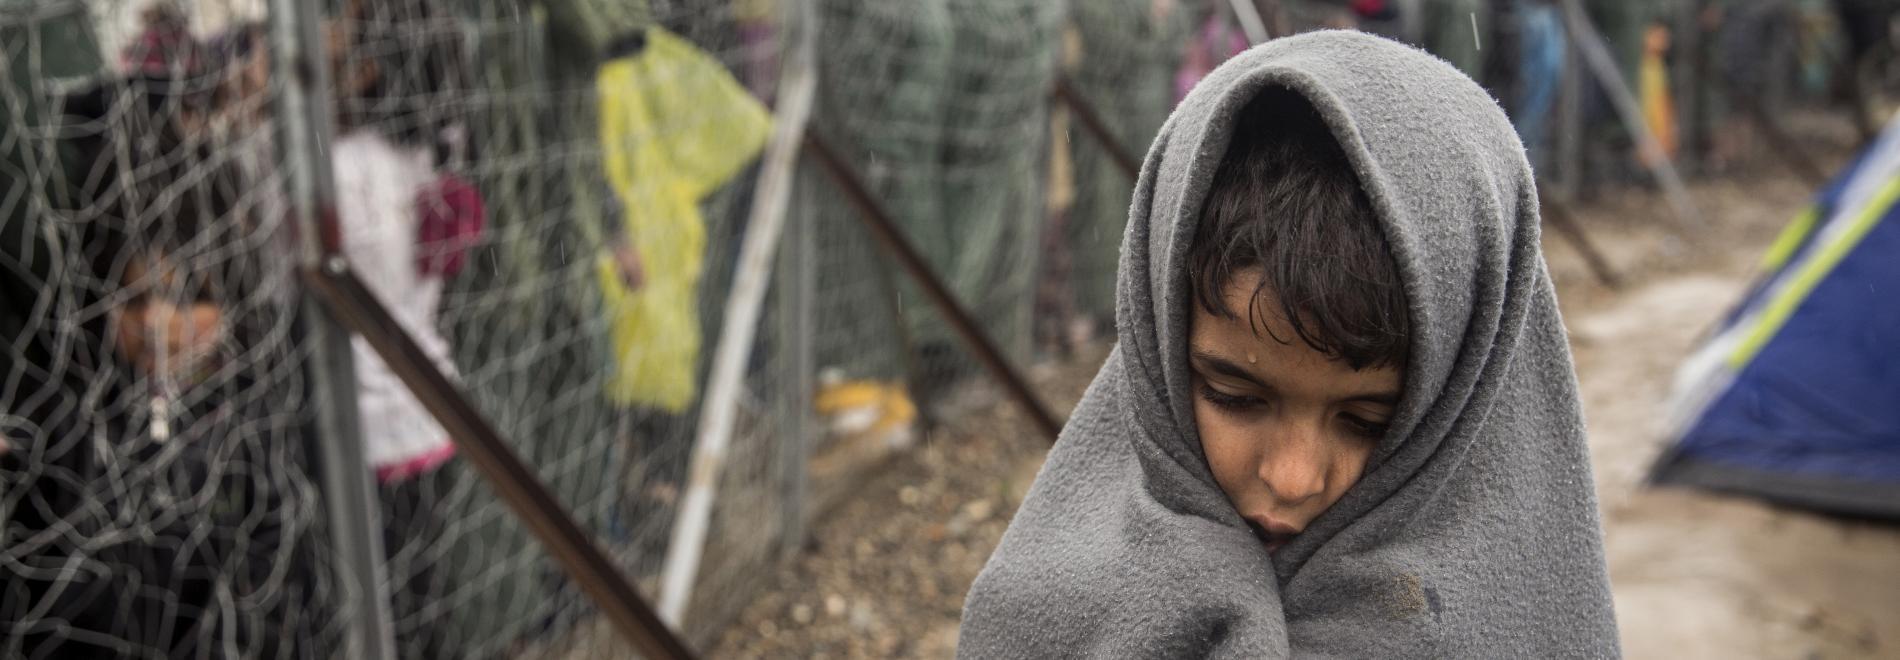 Flüchtlingsjunge auf Idomeni. Foto: Olmo Calvo